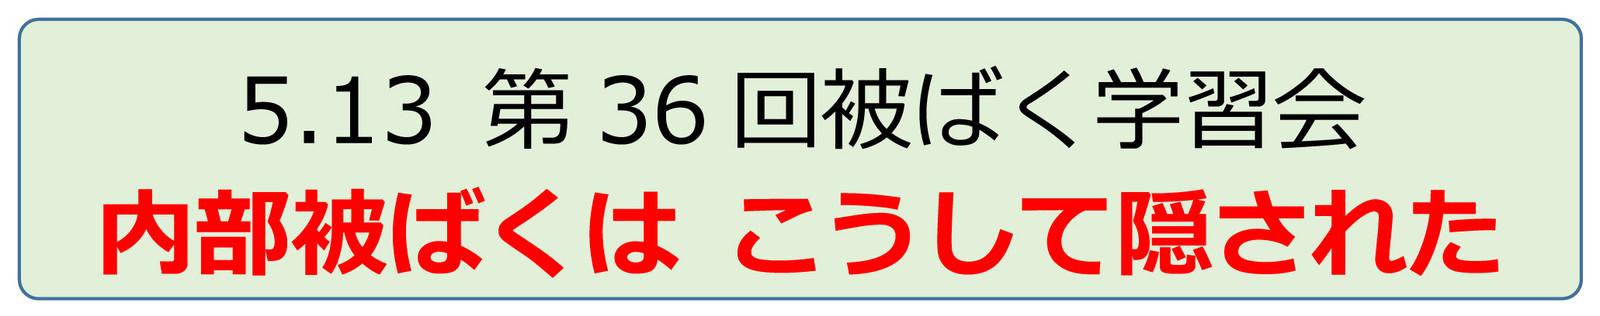 201705133_